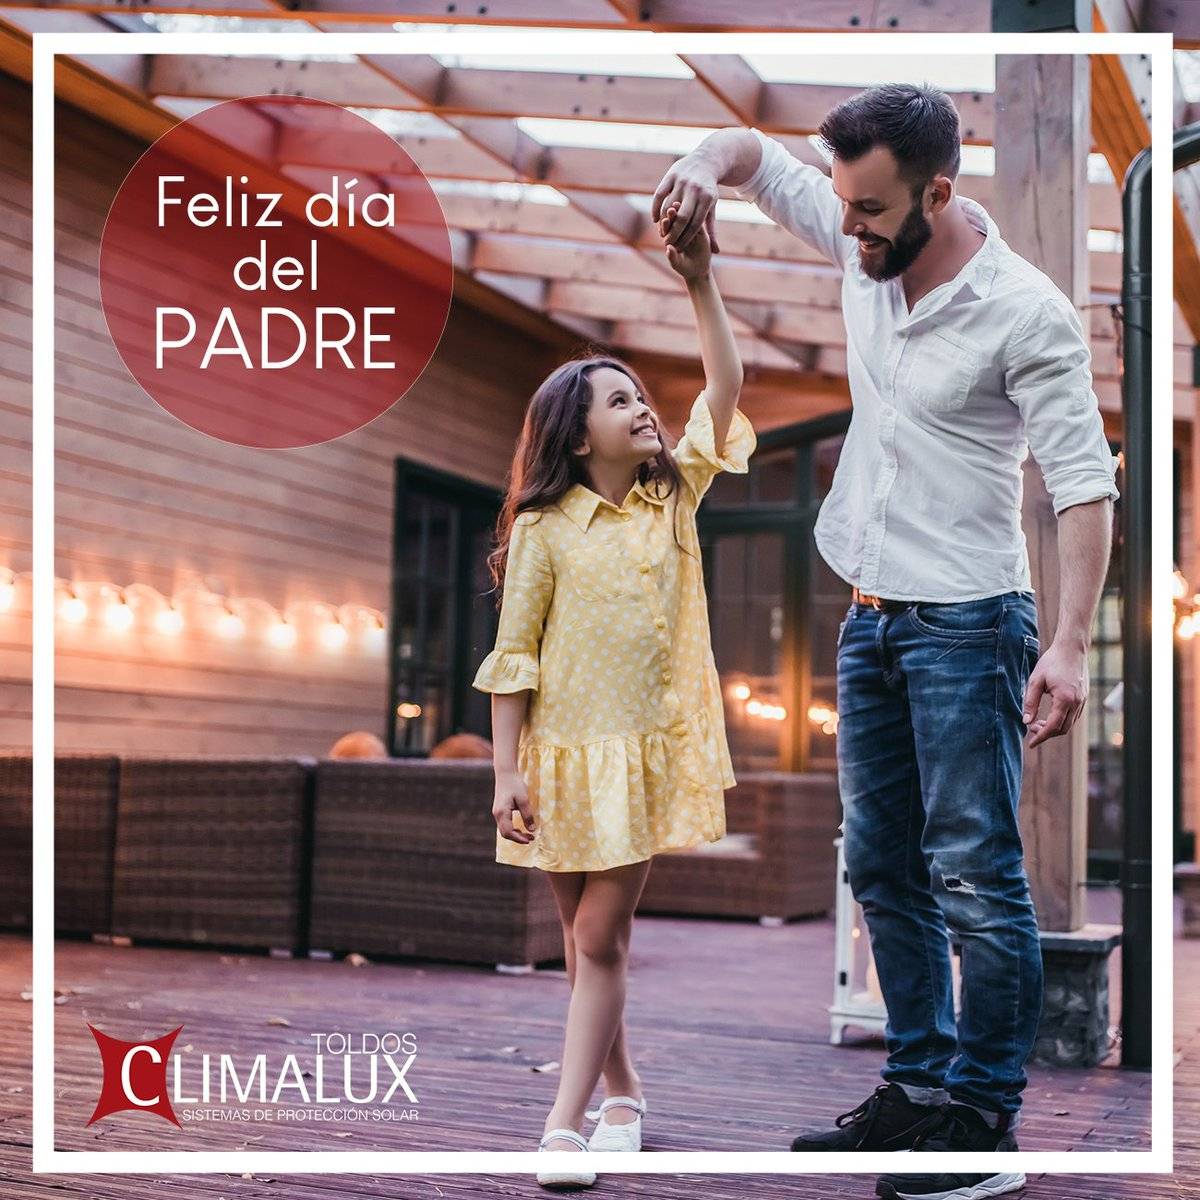 ¡Desde #ToldosClimalux queremos felicitar este día a todos los padres! 🎉 . . . #climalux #toldosypersianas #toldosautomatizados #toldo #toldos #pergola #pergolaMillenium #pergolasbioclimaticas #pergoladesign #deco #design #terraza #balcon #toldosclimalux #diadelpadre https://t.co/OOM8yCwx3H